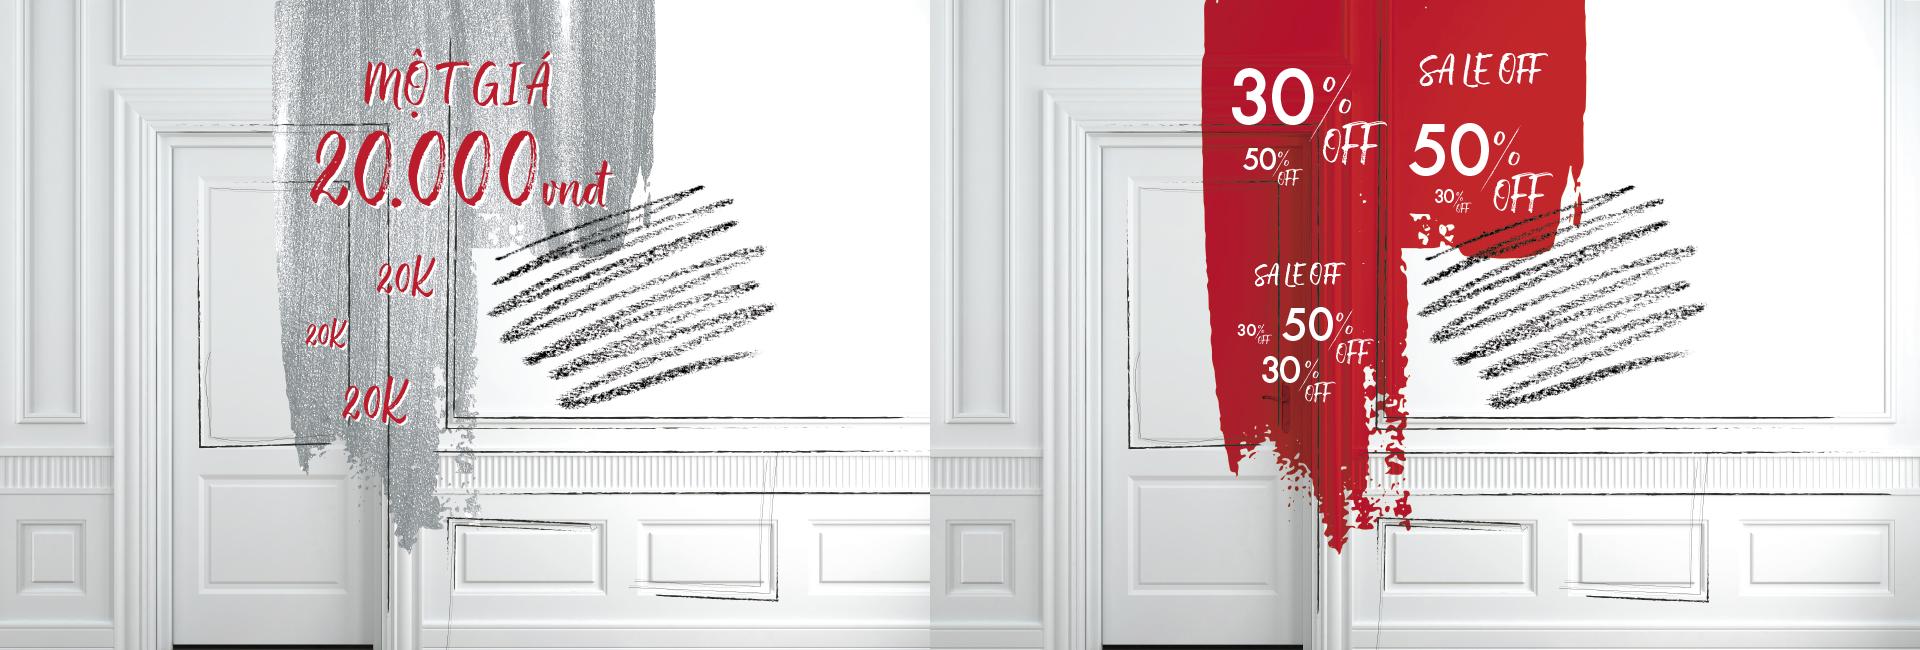 BANNER web 1920 x650 – SALE OFF